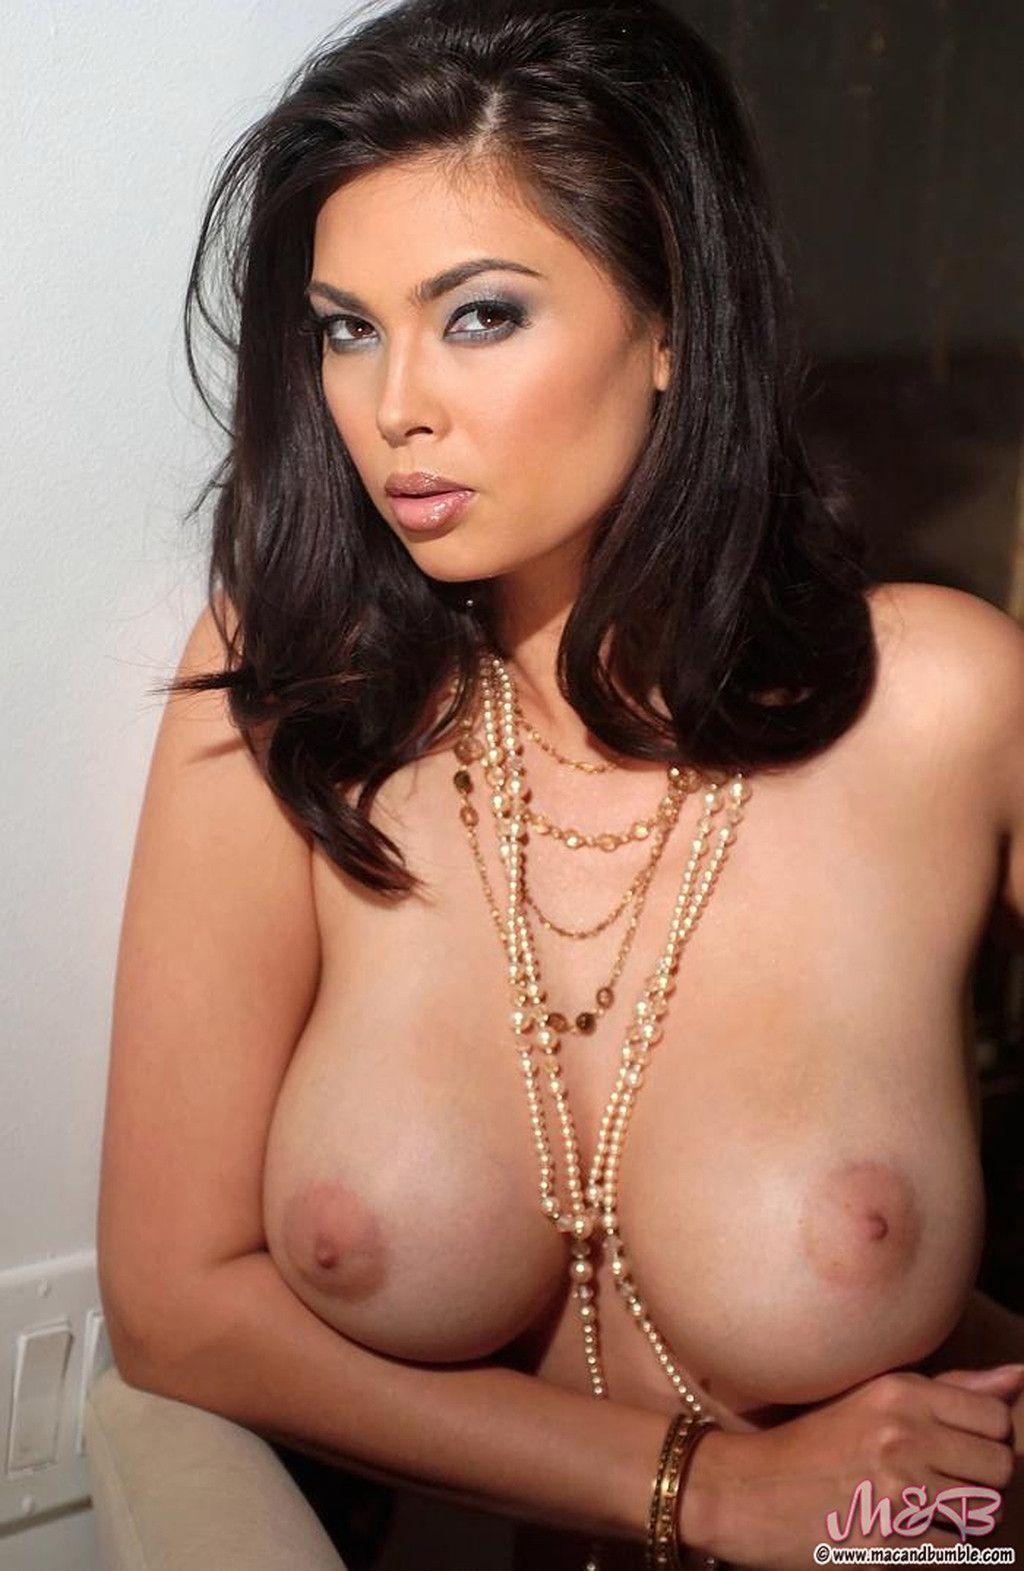 free pixs of naked hot jailbate girls xxx